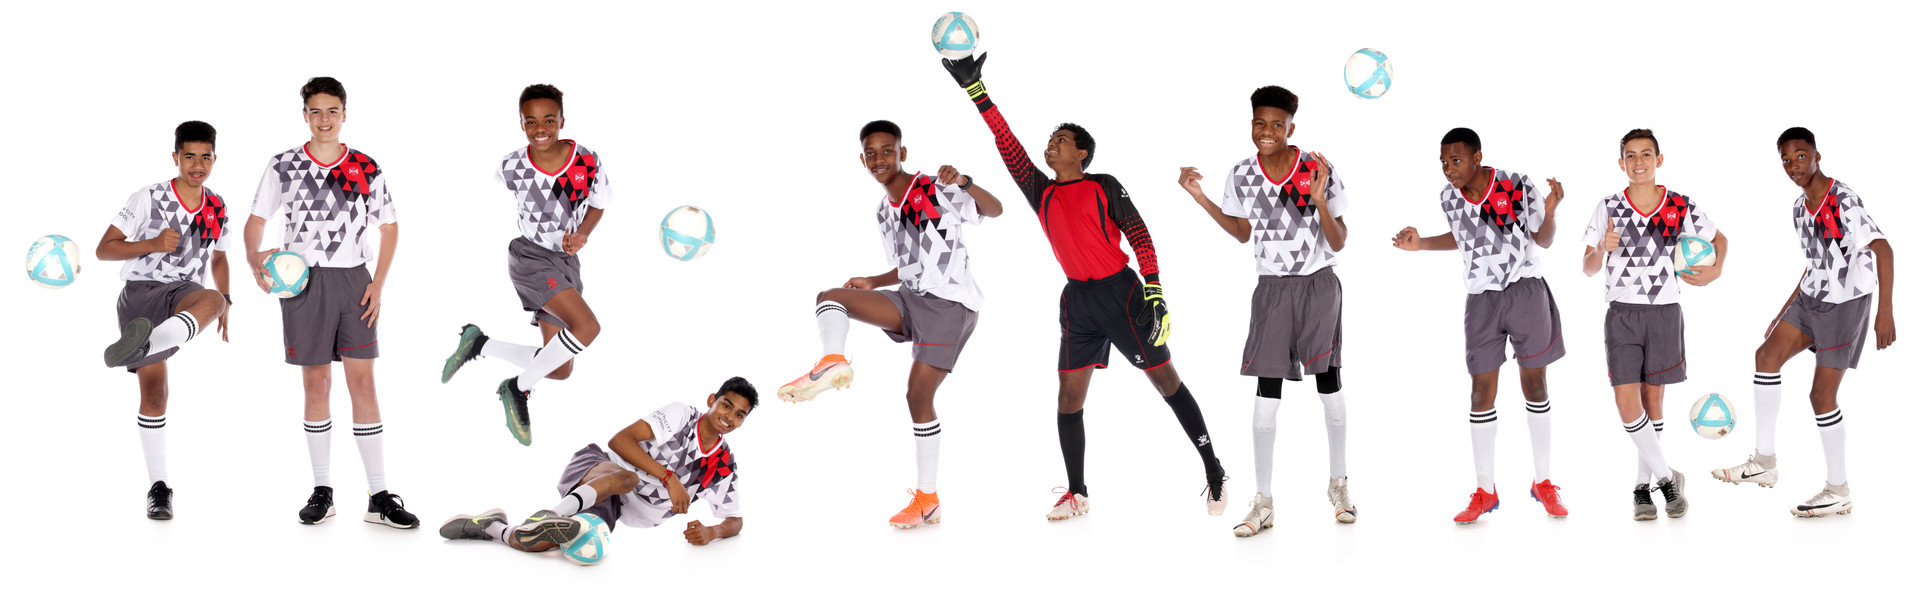 FootballUnder16Boys2019.jpg